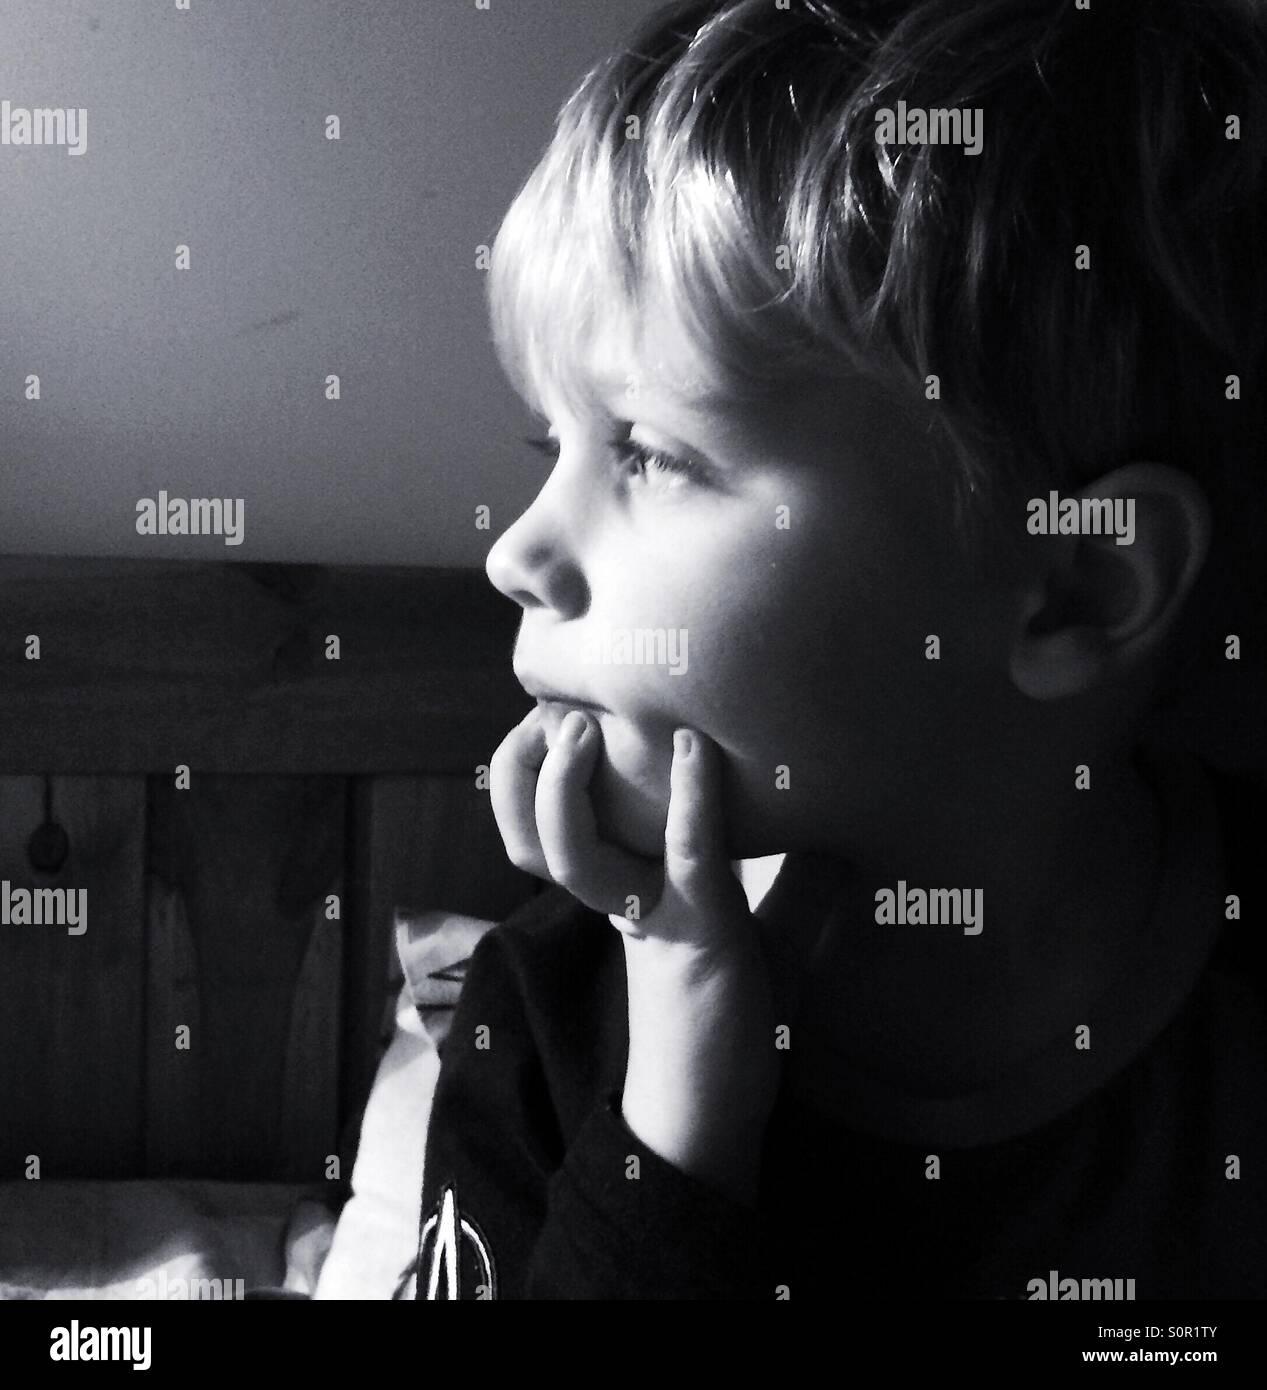 Bored child - Stock Image